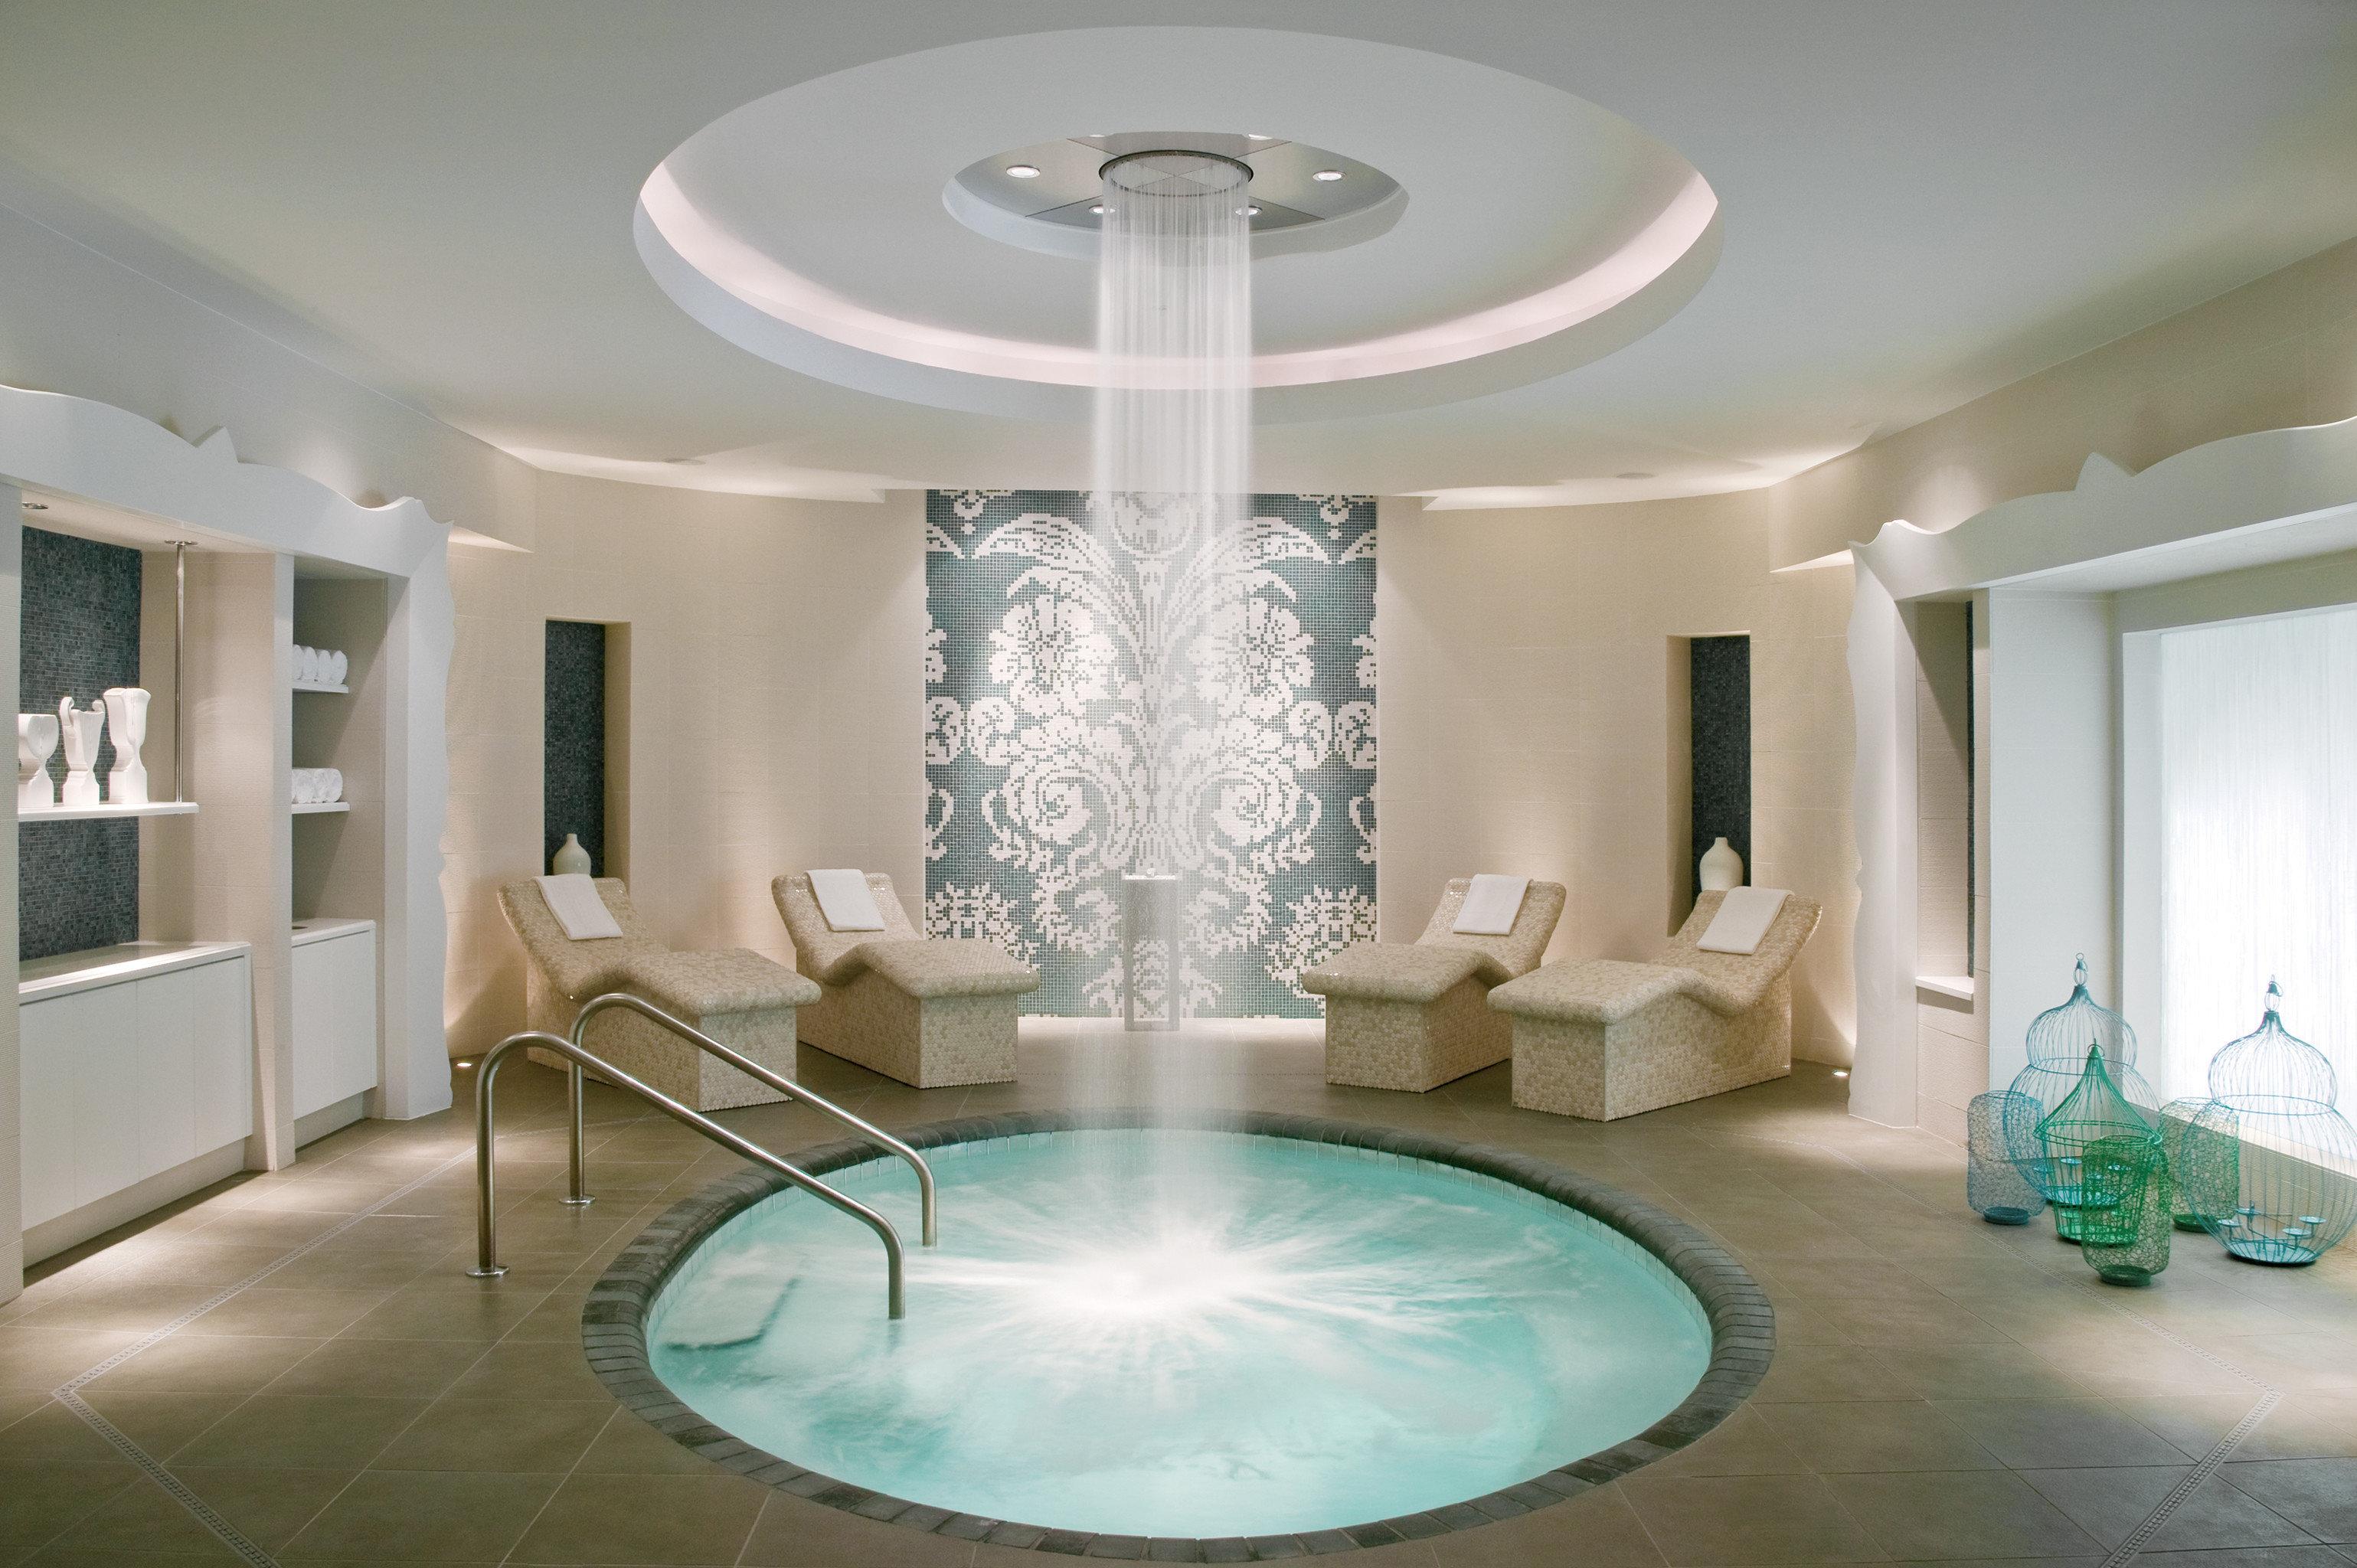 Modern Resort Spa Wellness property living room lighting daylighting swimming pool condominium mansion